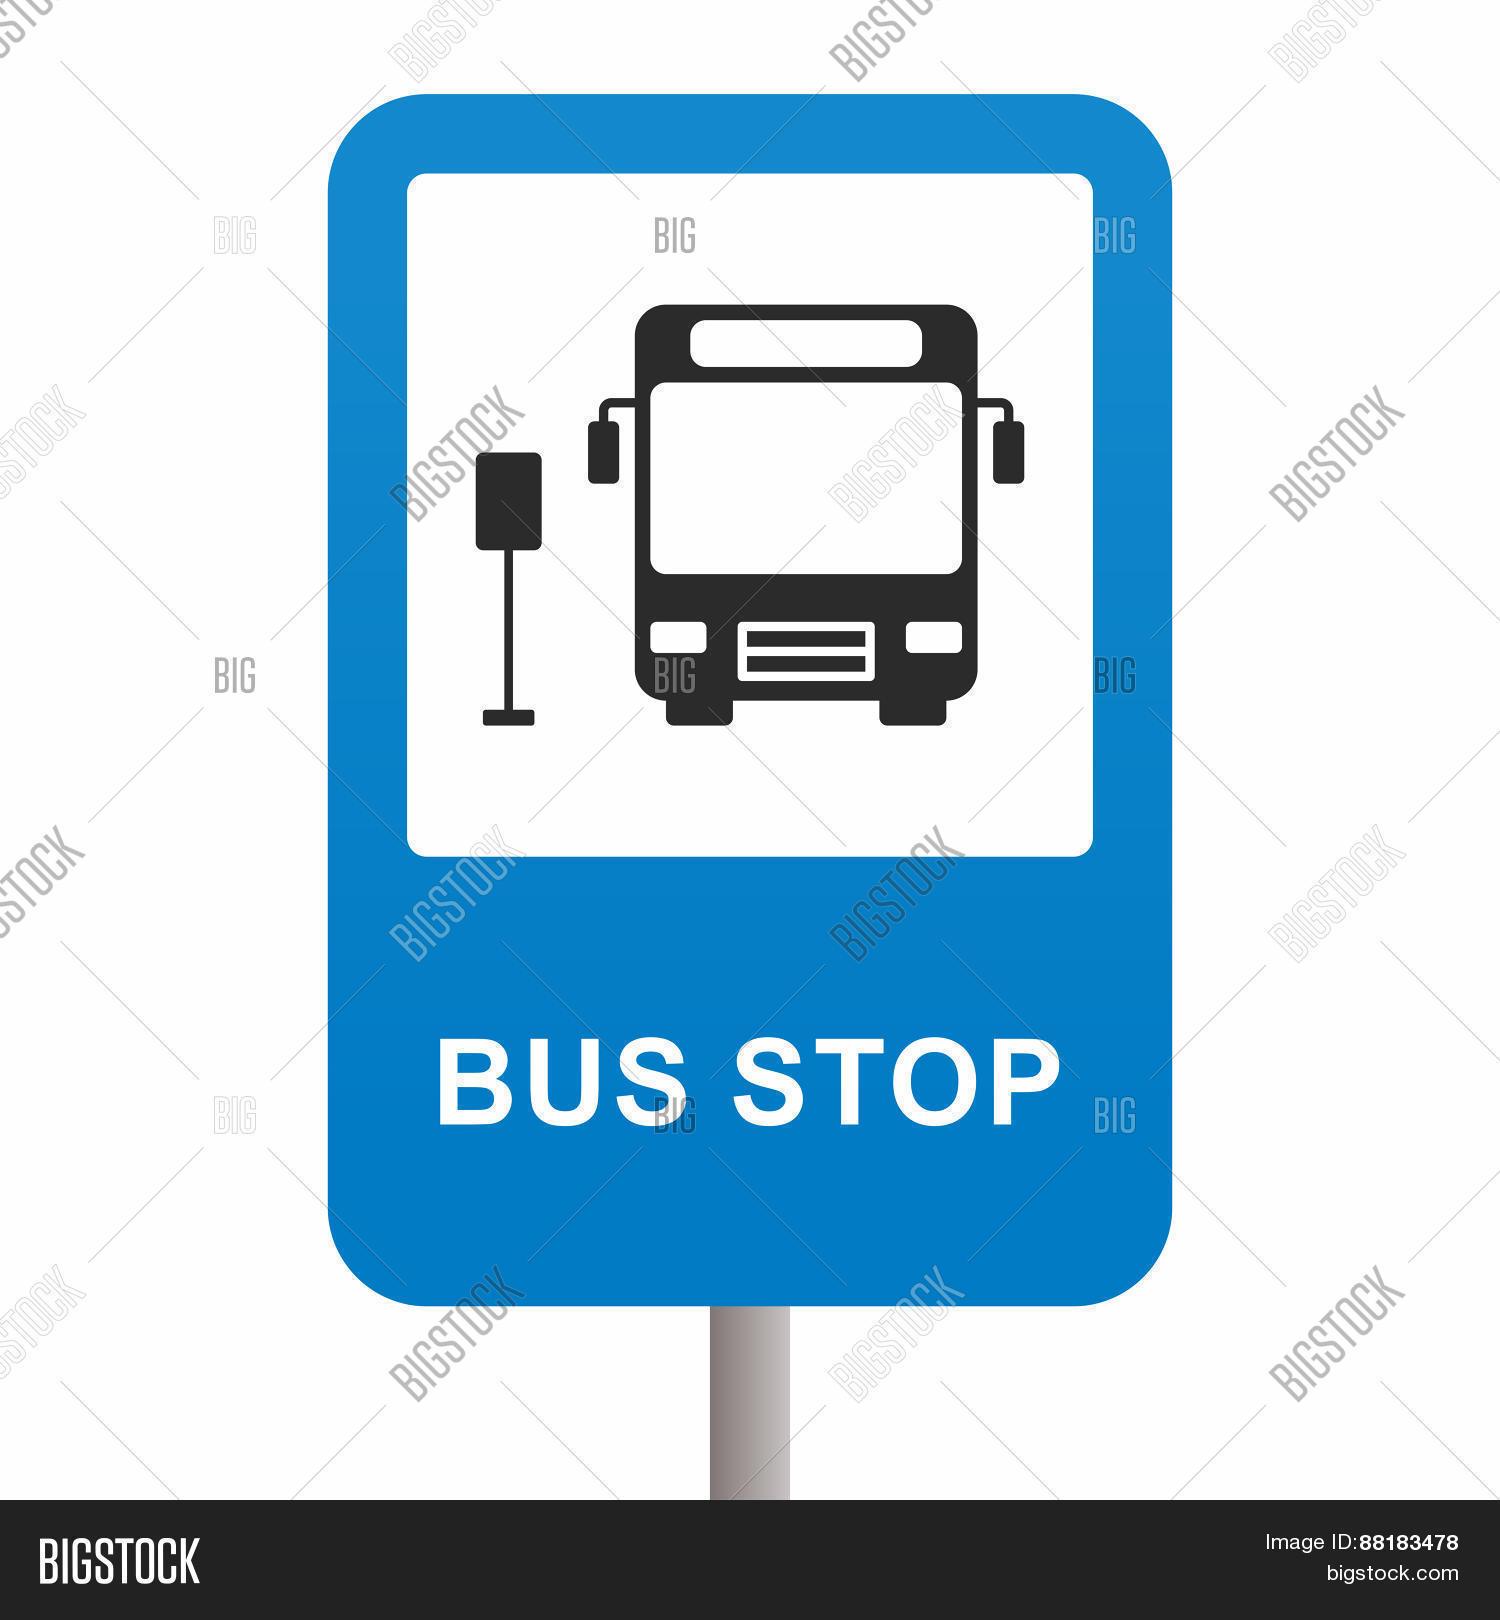 Bus Stop Sign Vector & Photo | Bigstock